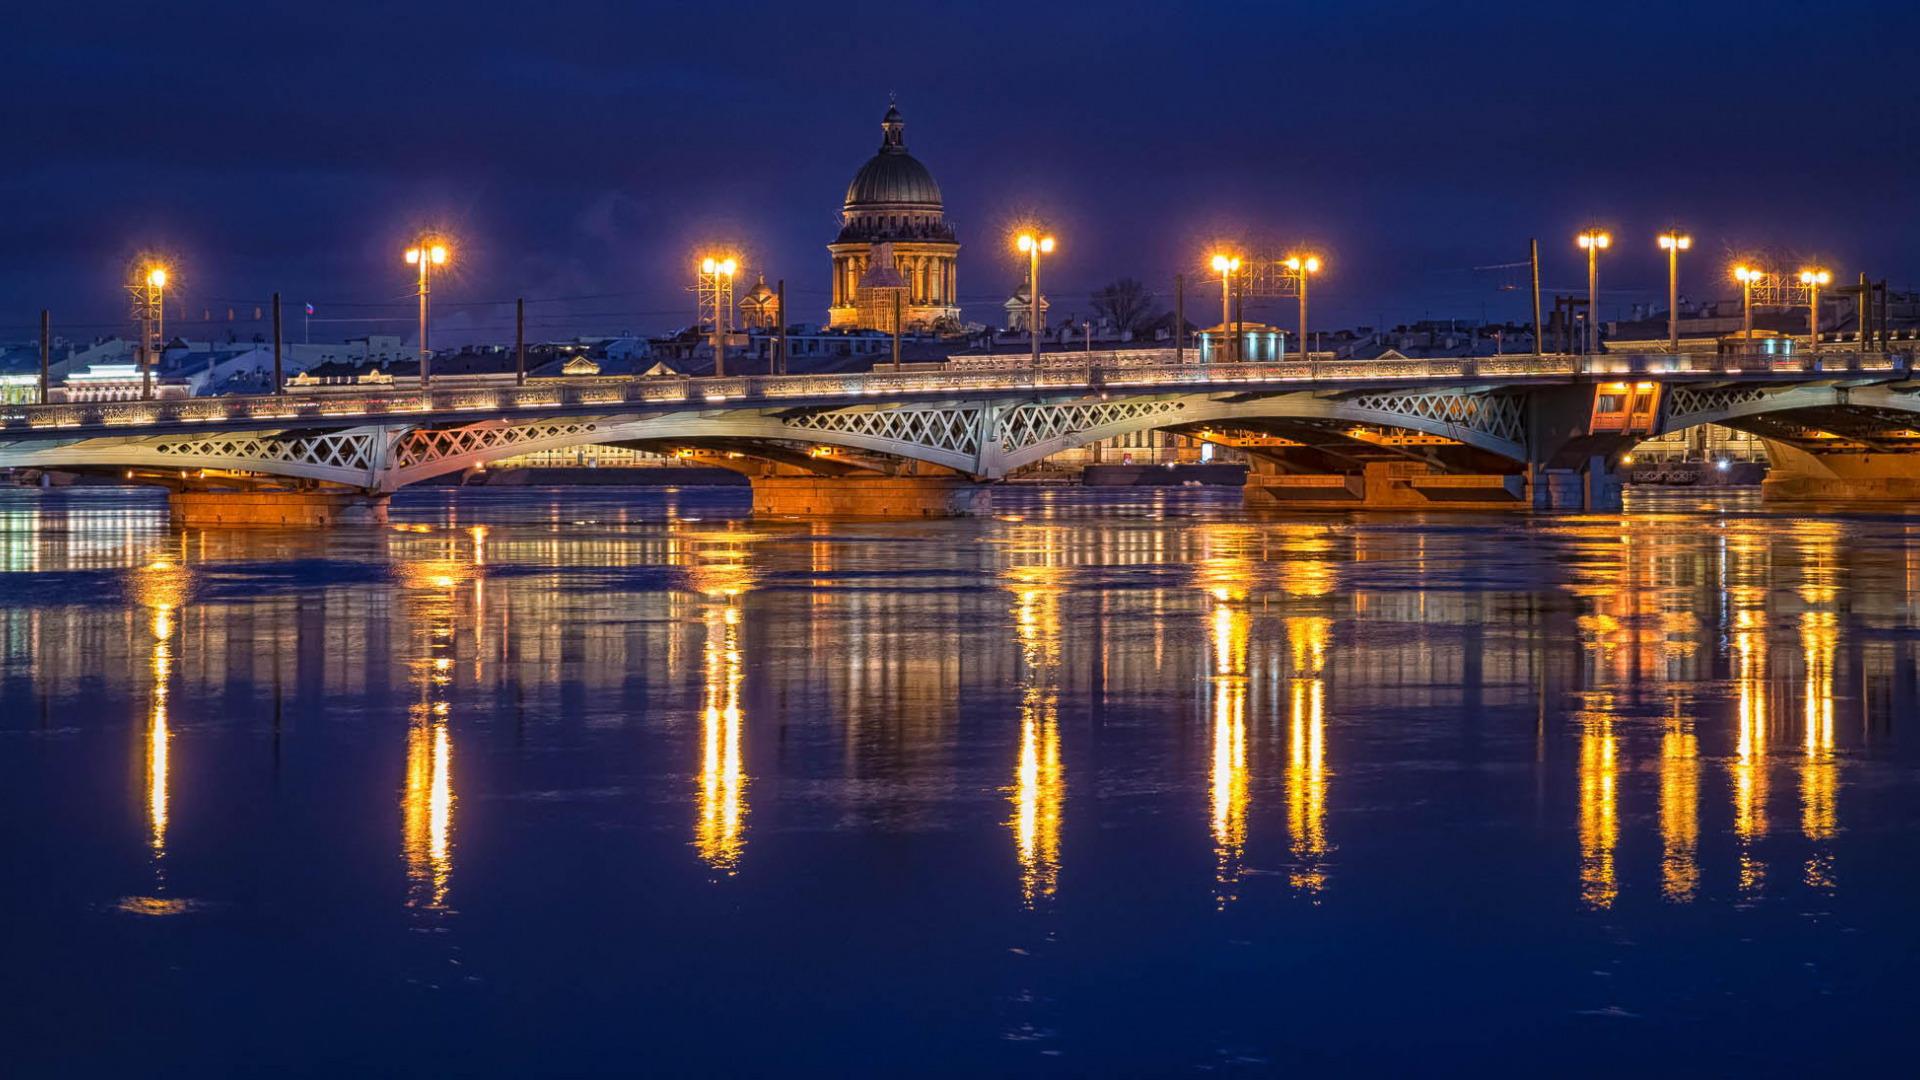 http://img3.goodfon.ru/original/1920x1080/8/45/sankt-peterburg-piter-st-3940.jpg